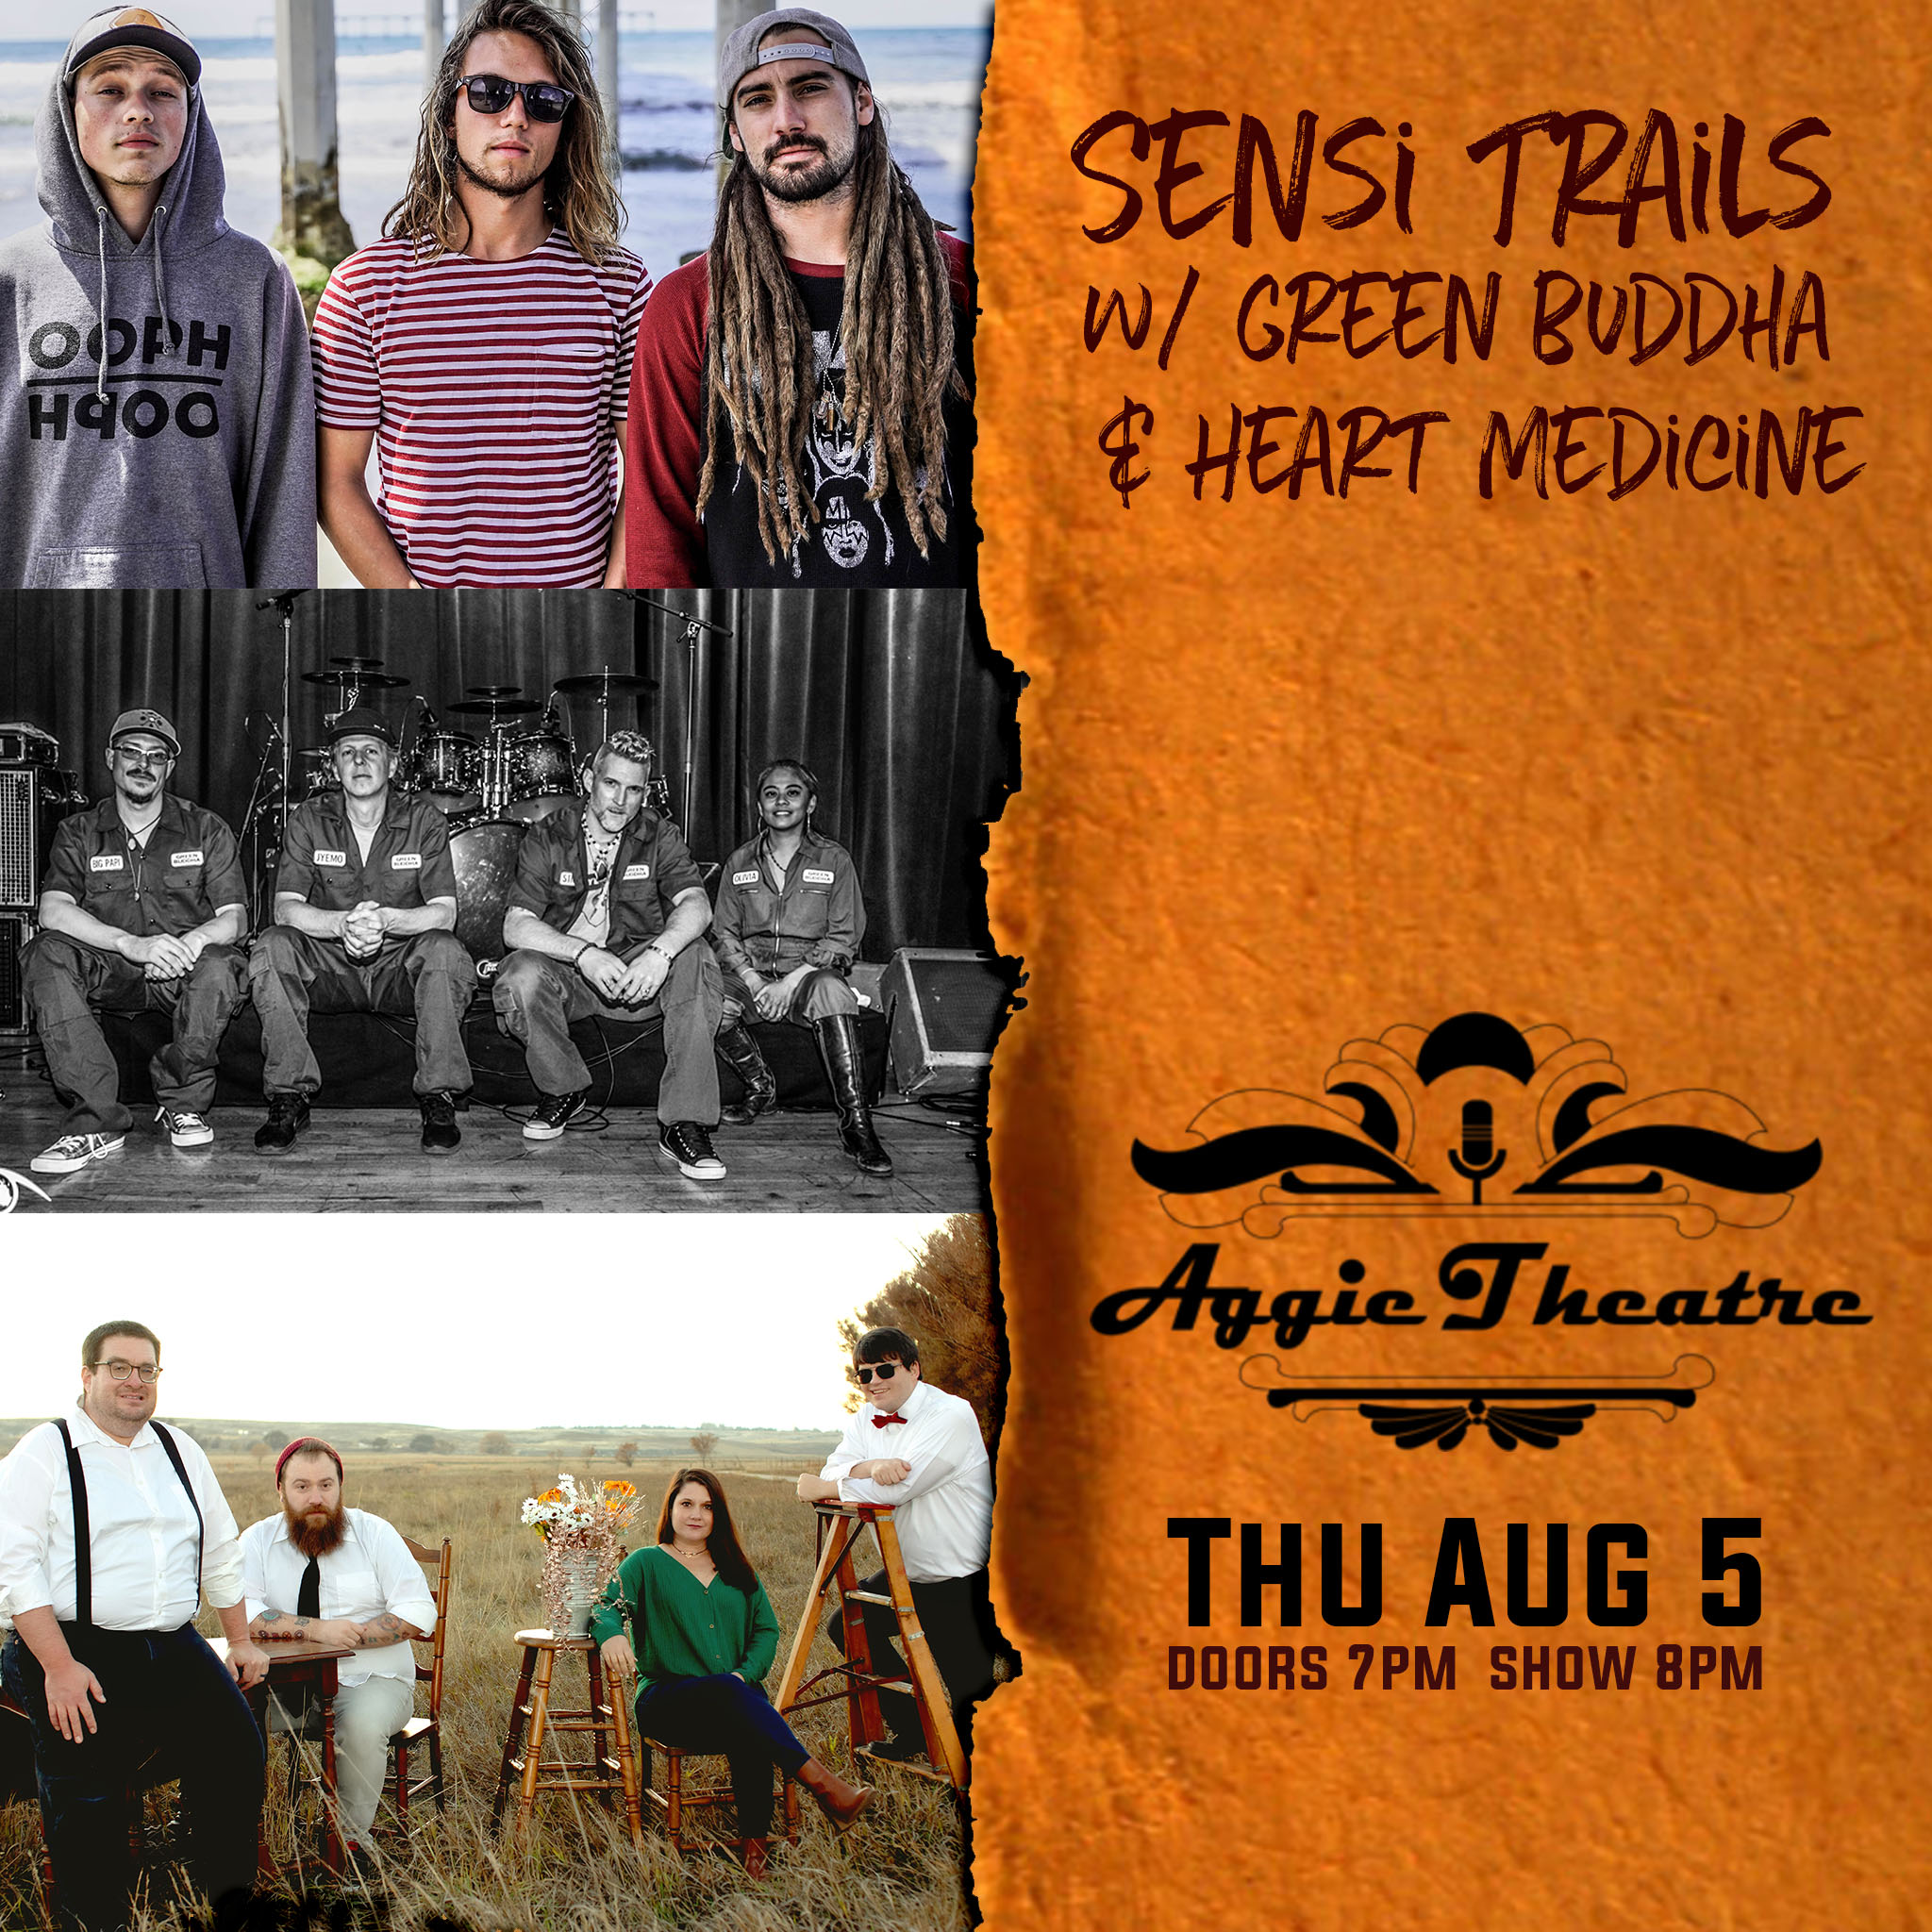 Aggie Theatre - Sensi Trails, Green Buddha w/ Heart Medicine